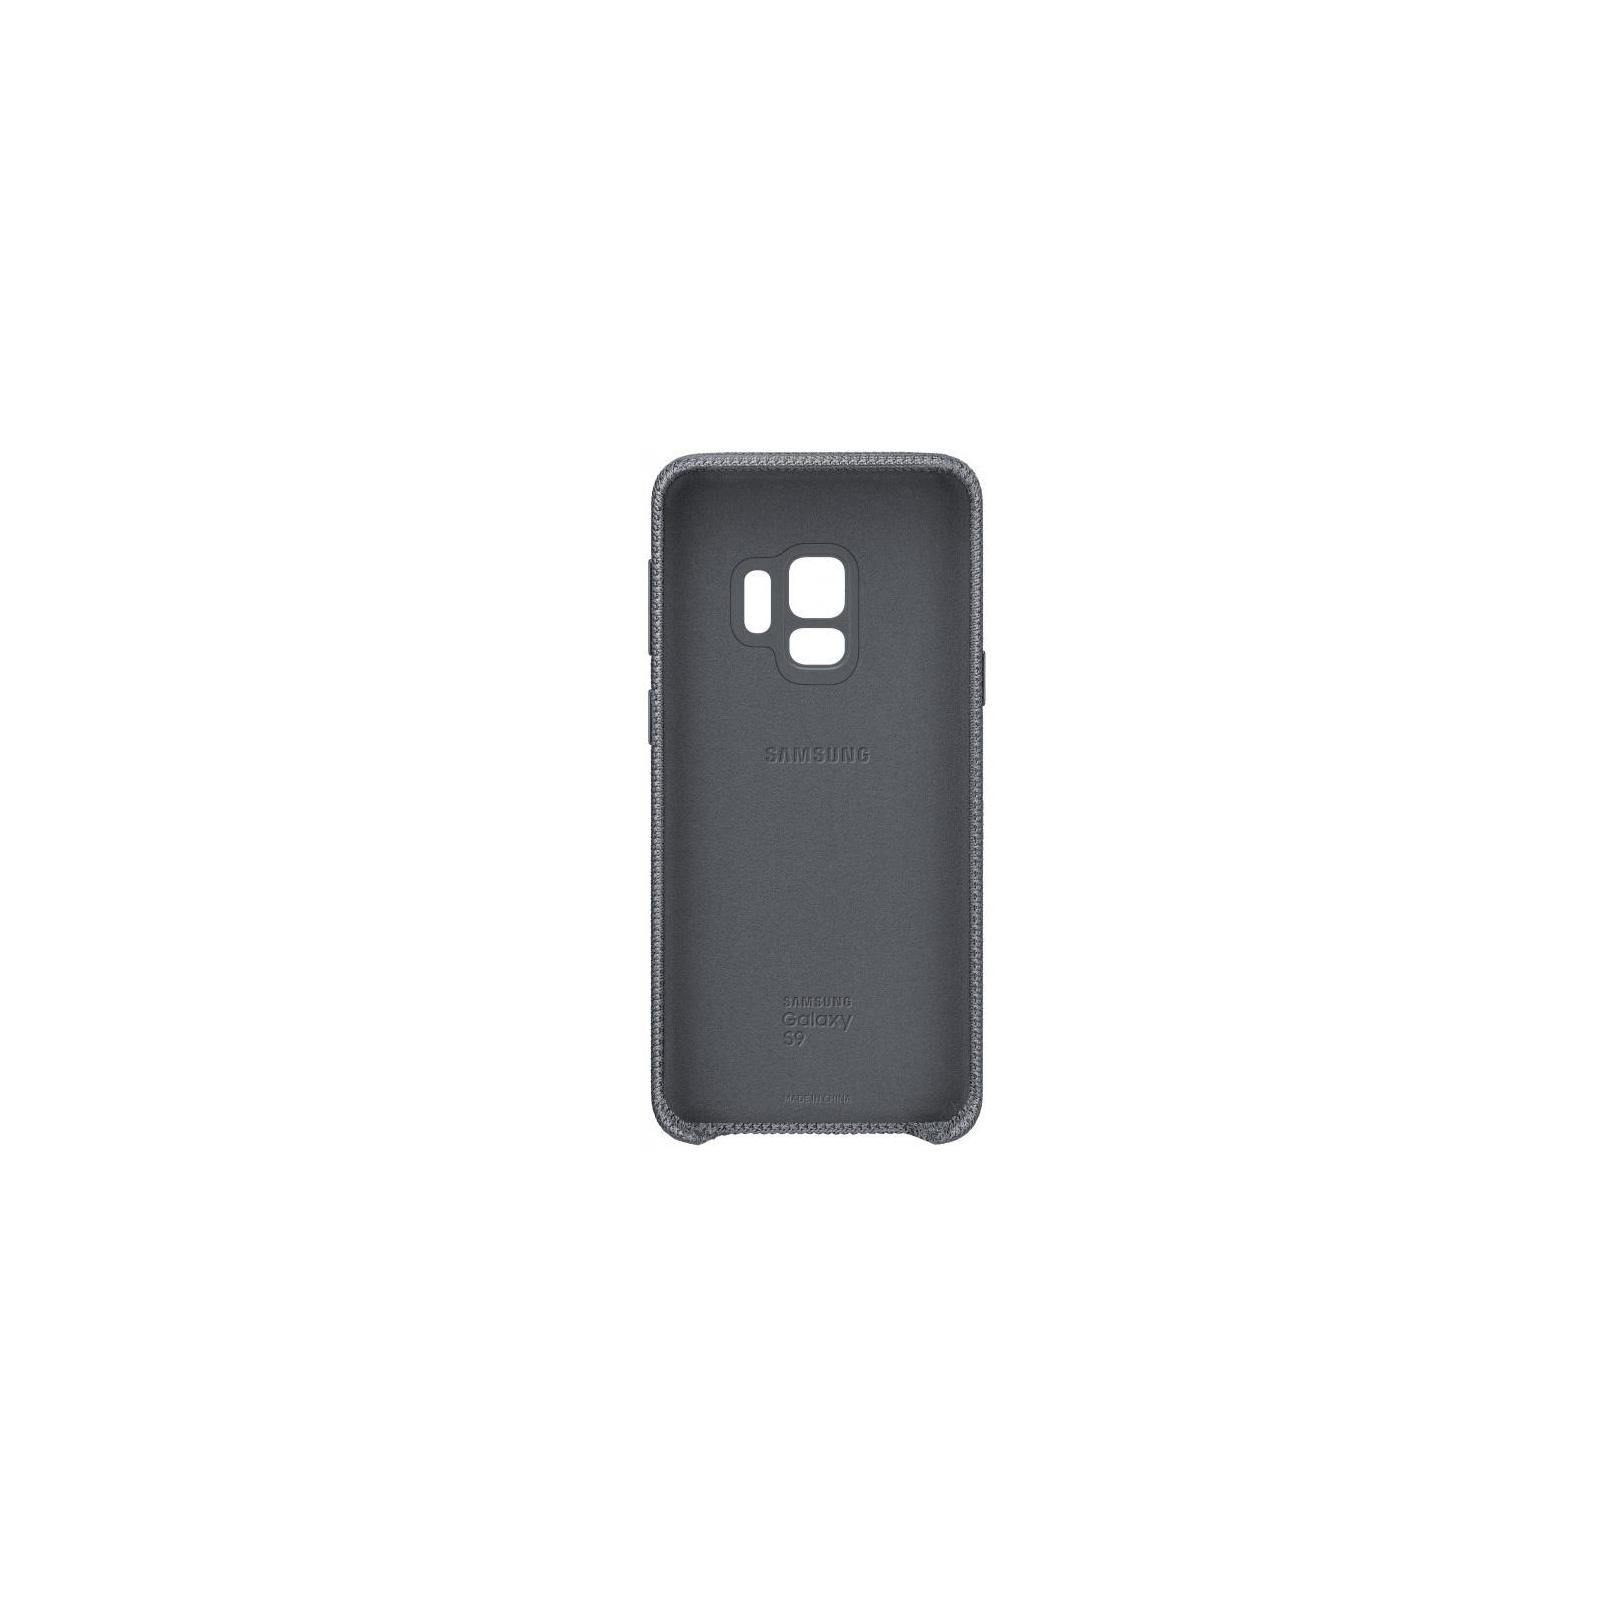 Чехол для моб. телефона Samsung для Galaxy S9 (G960) Hyperknit Cover Grey (EF-GG960FJEGRU) изображение 2